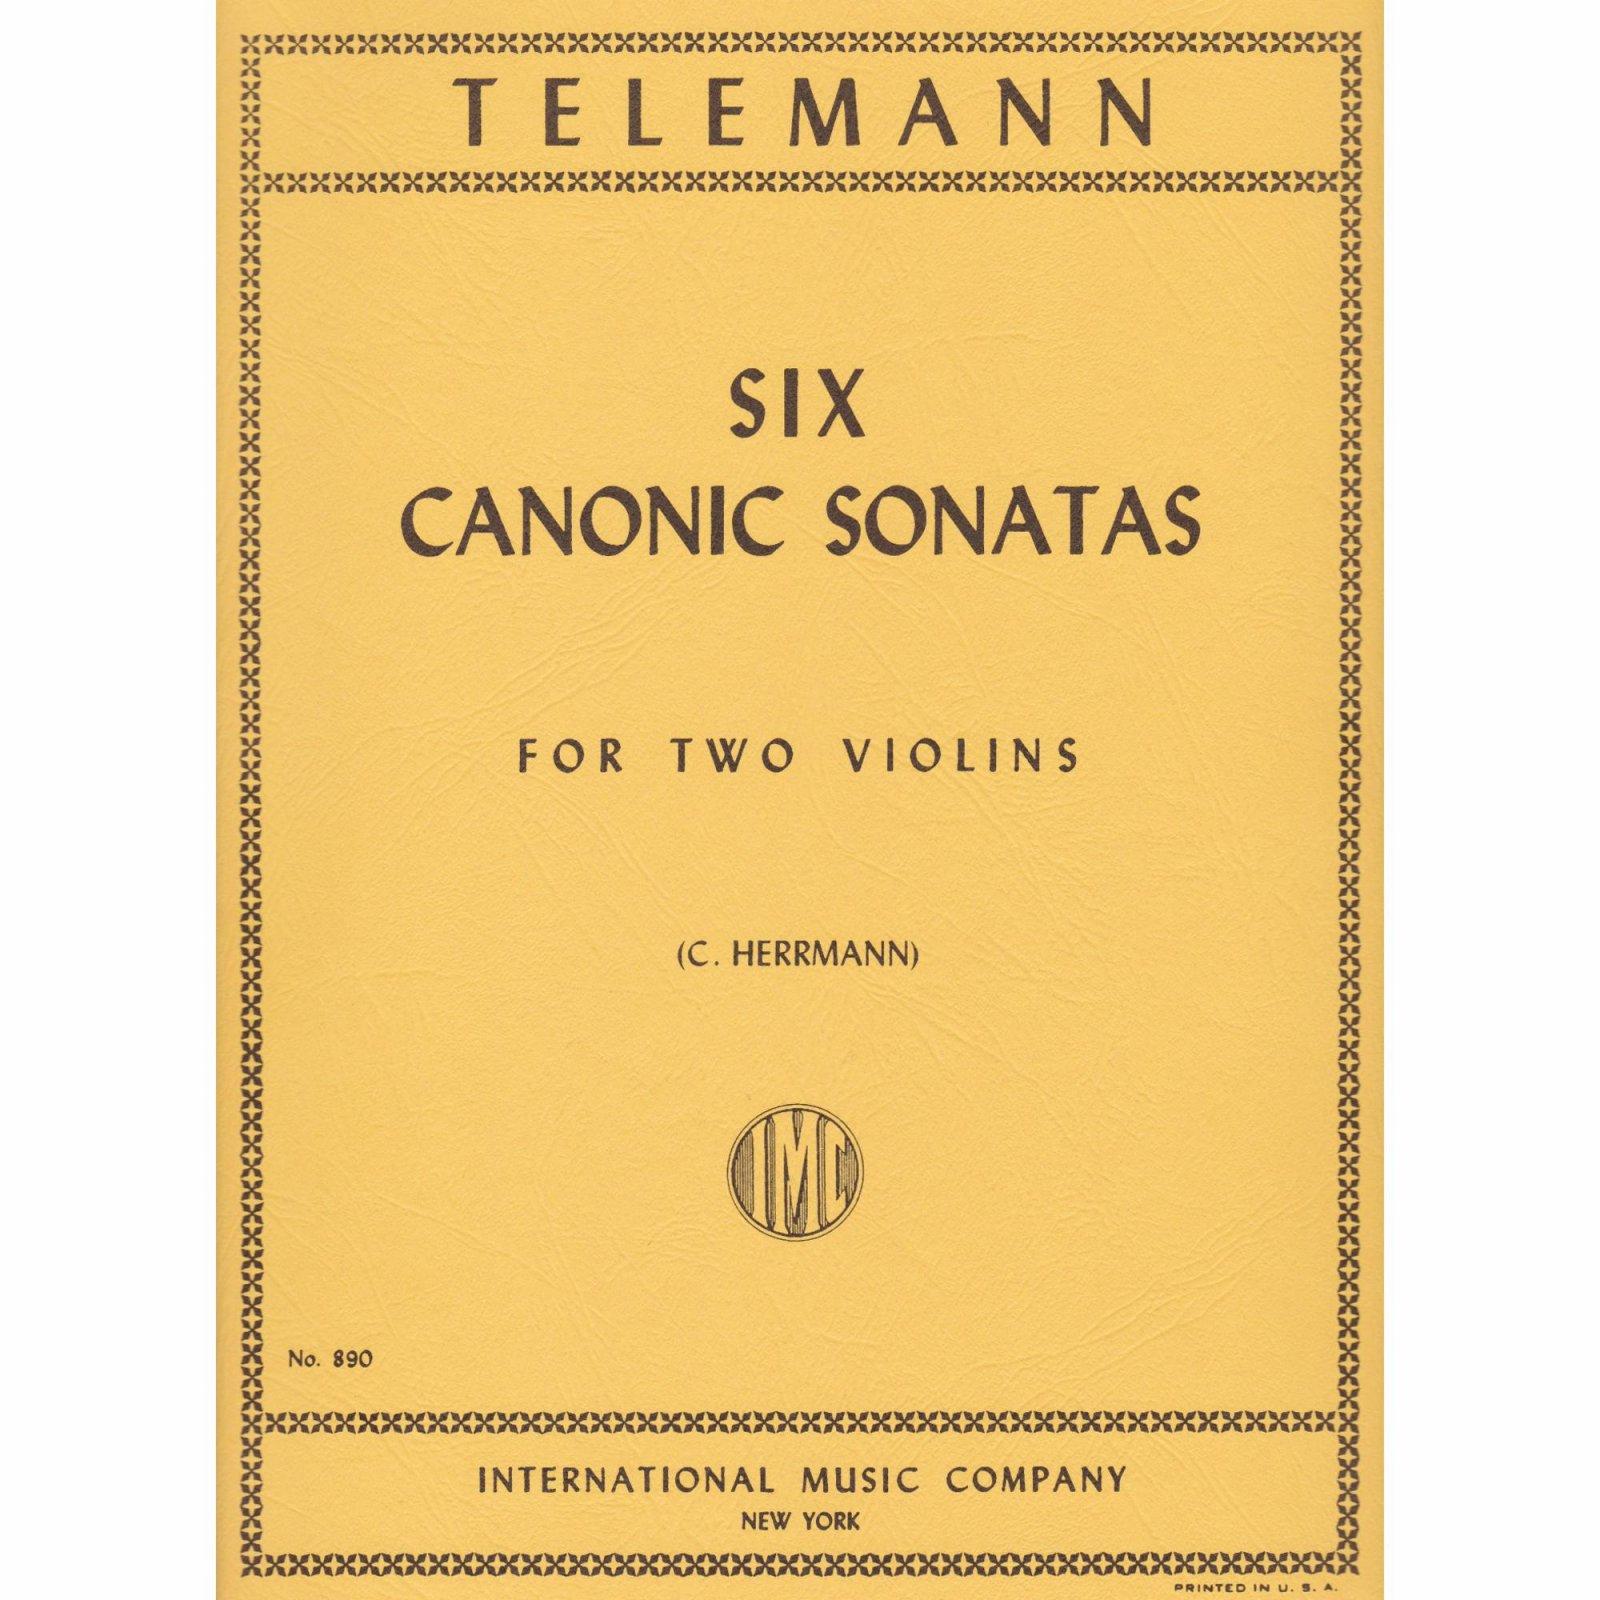 Telemann: Six Canonic Sonatas Ed. Herrmann